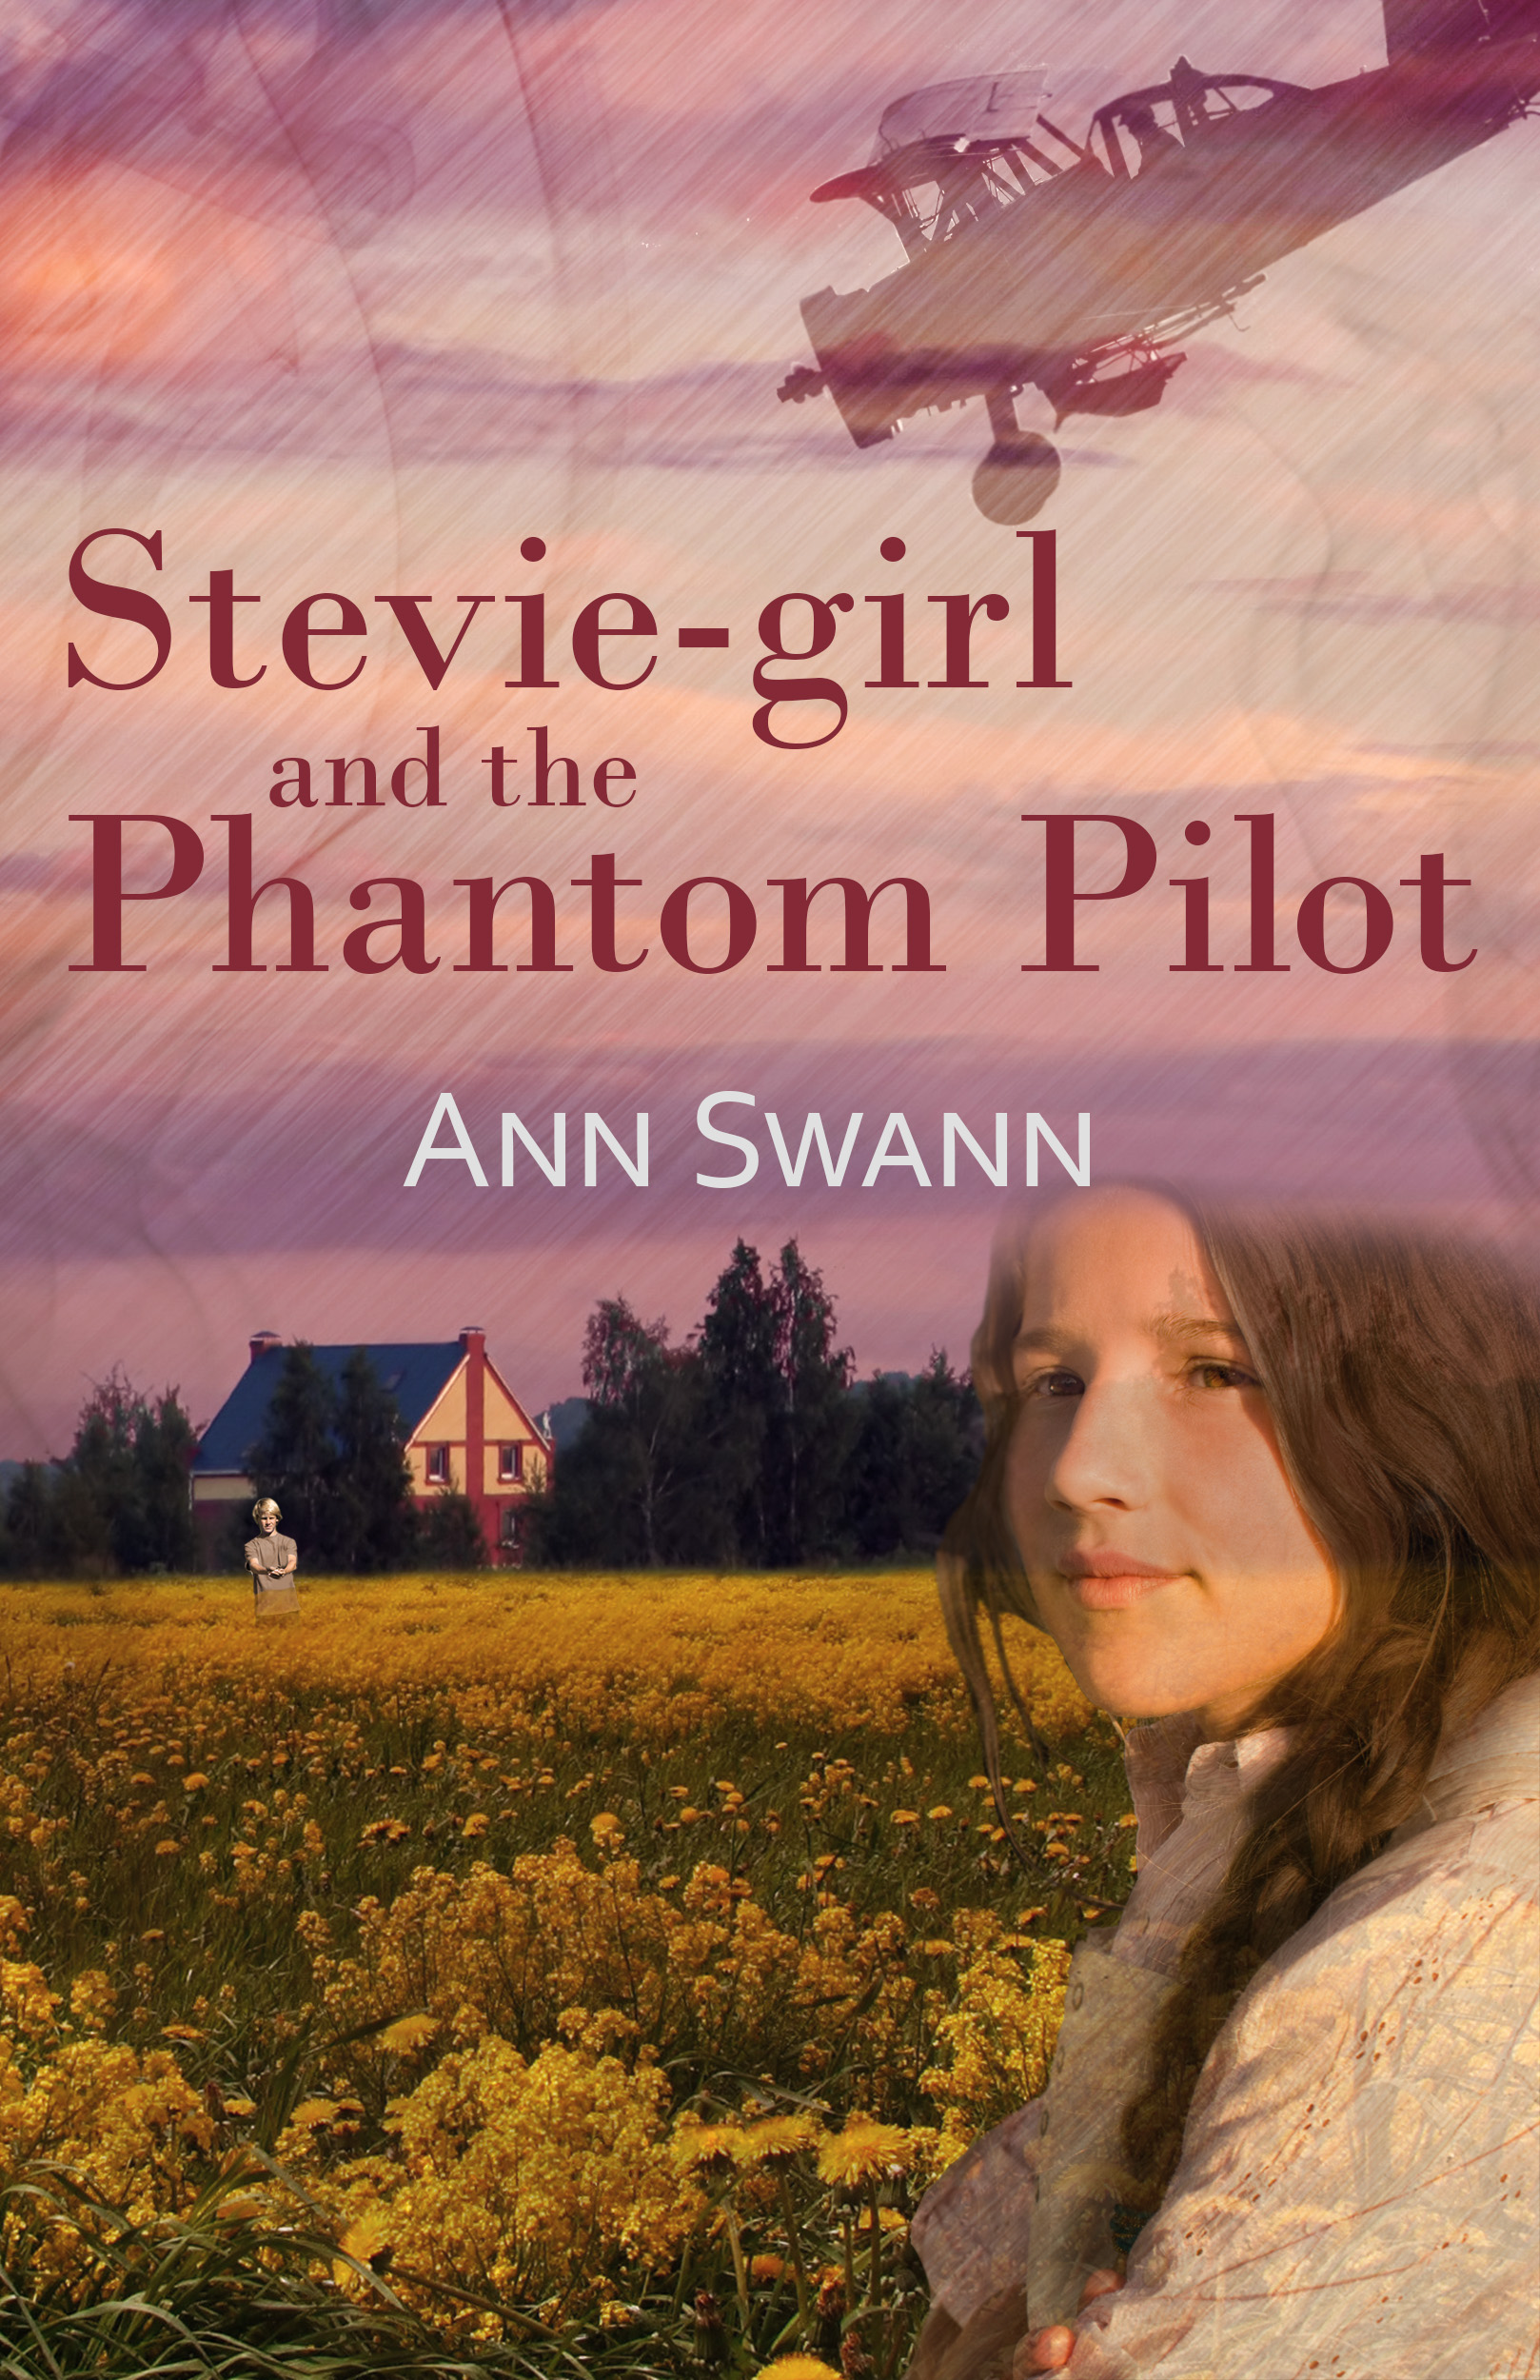 Stevie-girl and the Phantom Pilot (Book One of The Phantom Series)